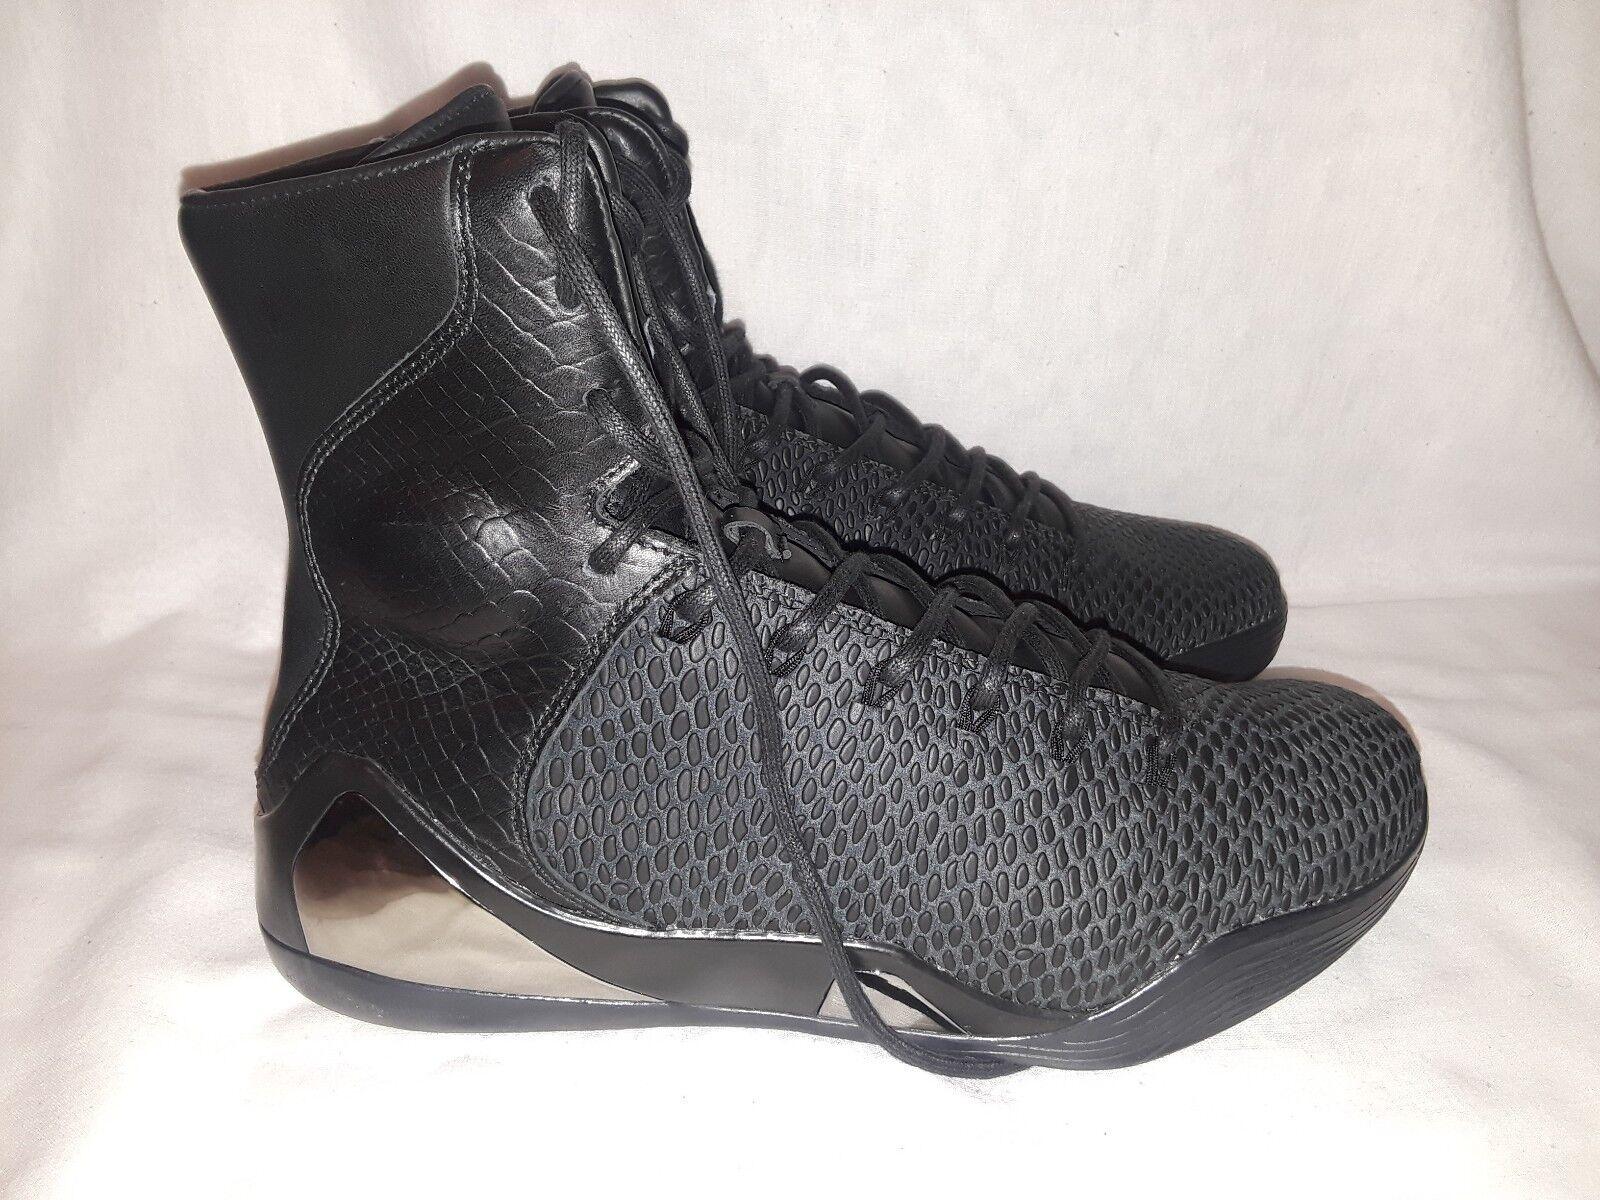 Men Nike Kobe 9 High KRM EXT QS Elite Black Mamba 11.5 shoes